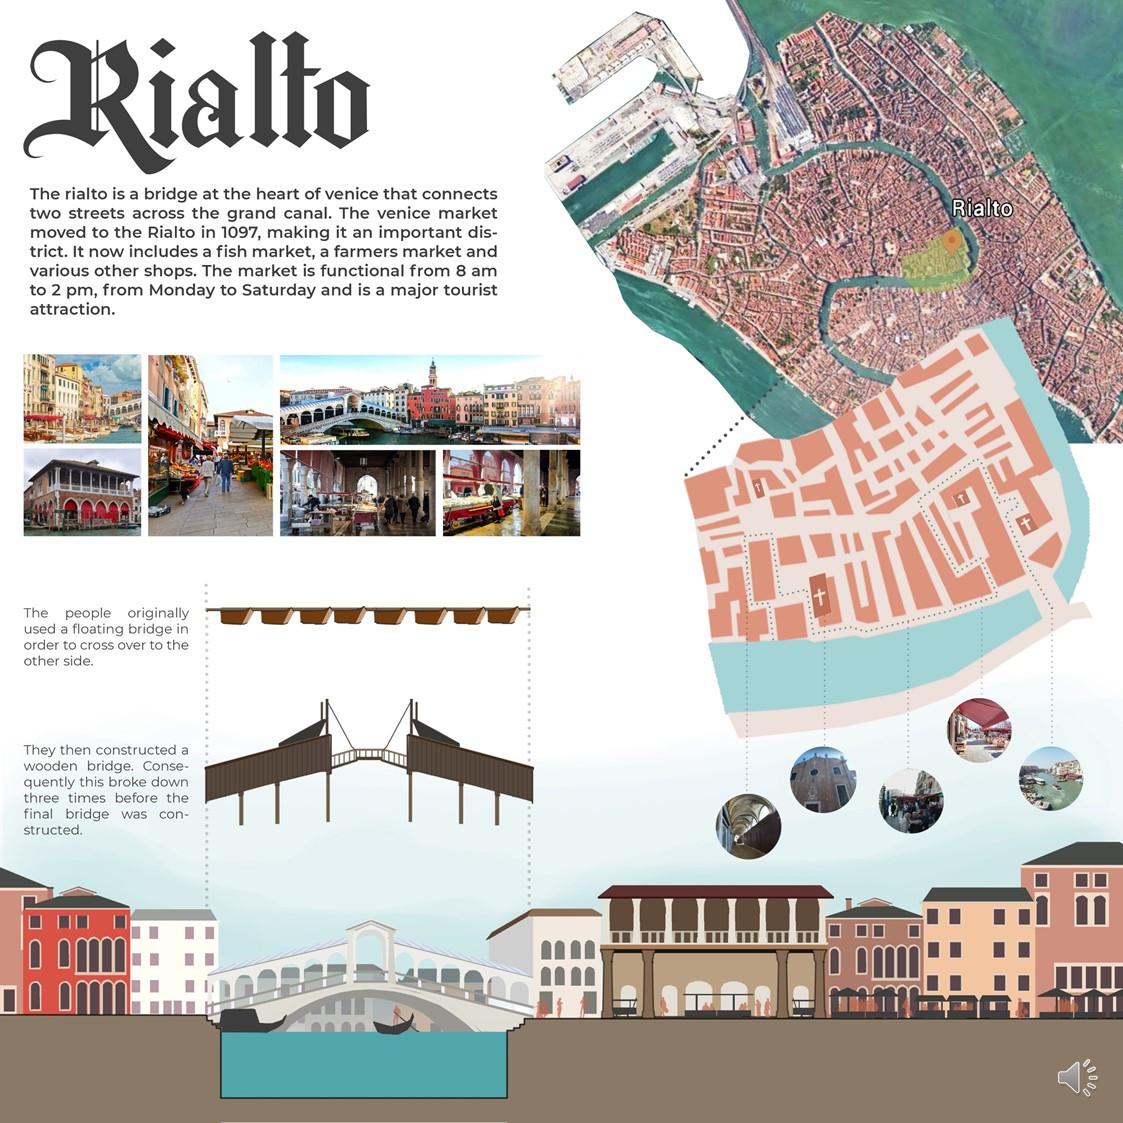 Streetscape Study of The High Line & Rialto